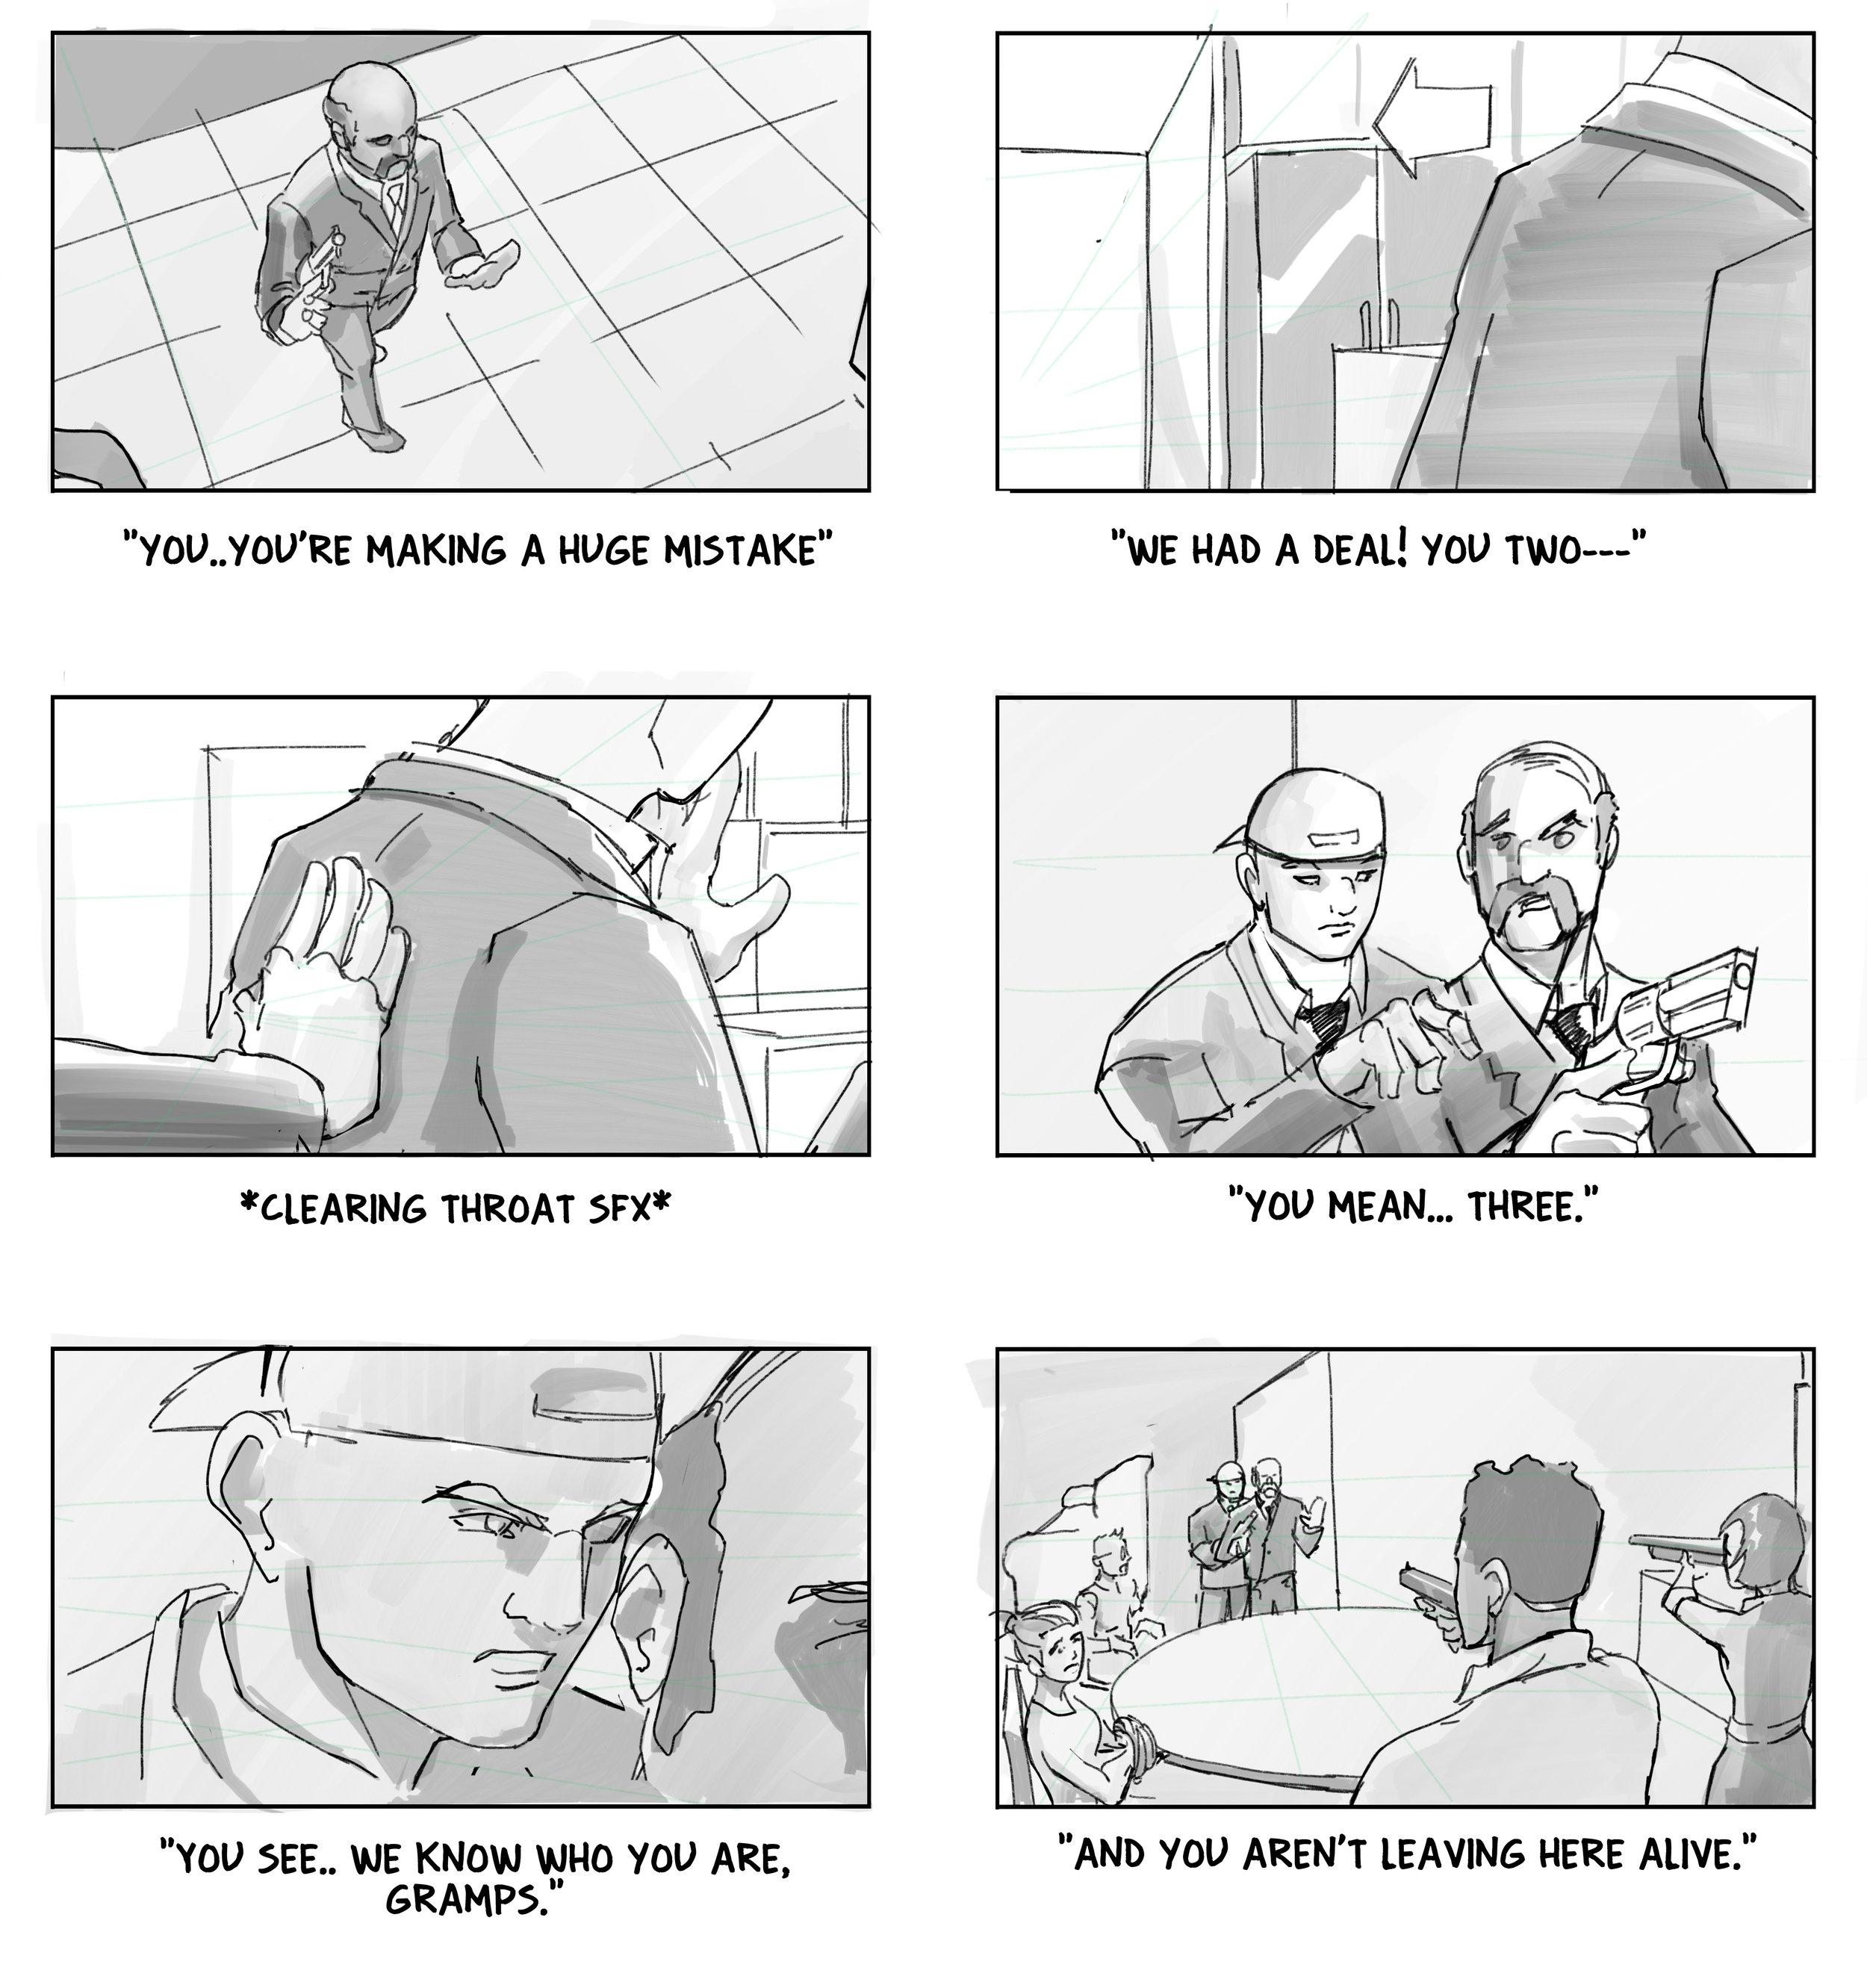 SAM_BS_Catapano_Storyboards_007.jpg